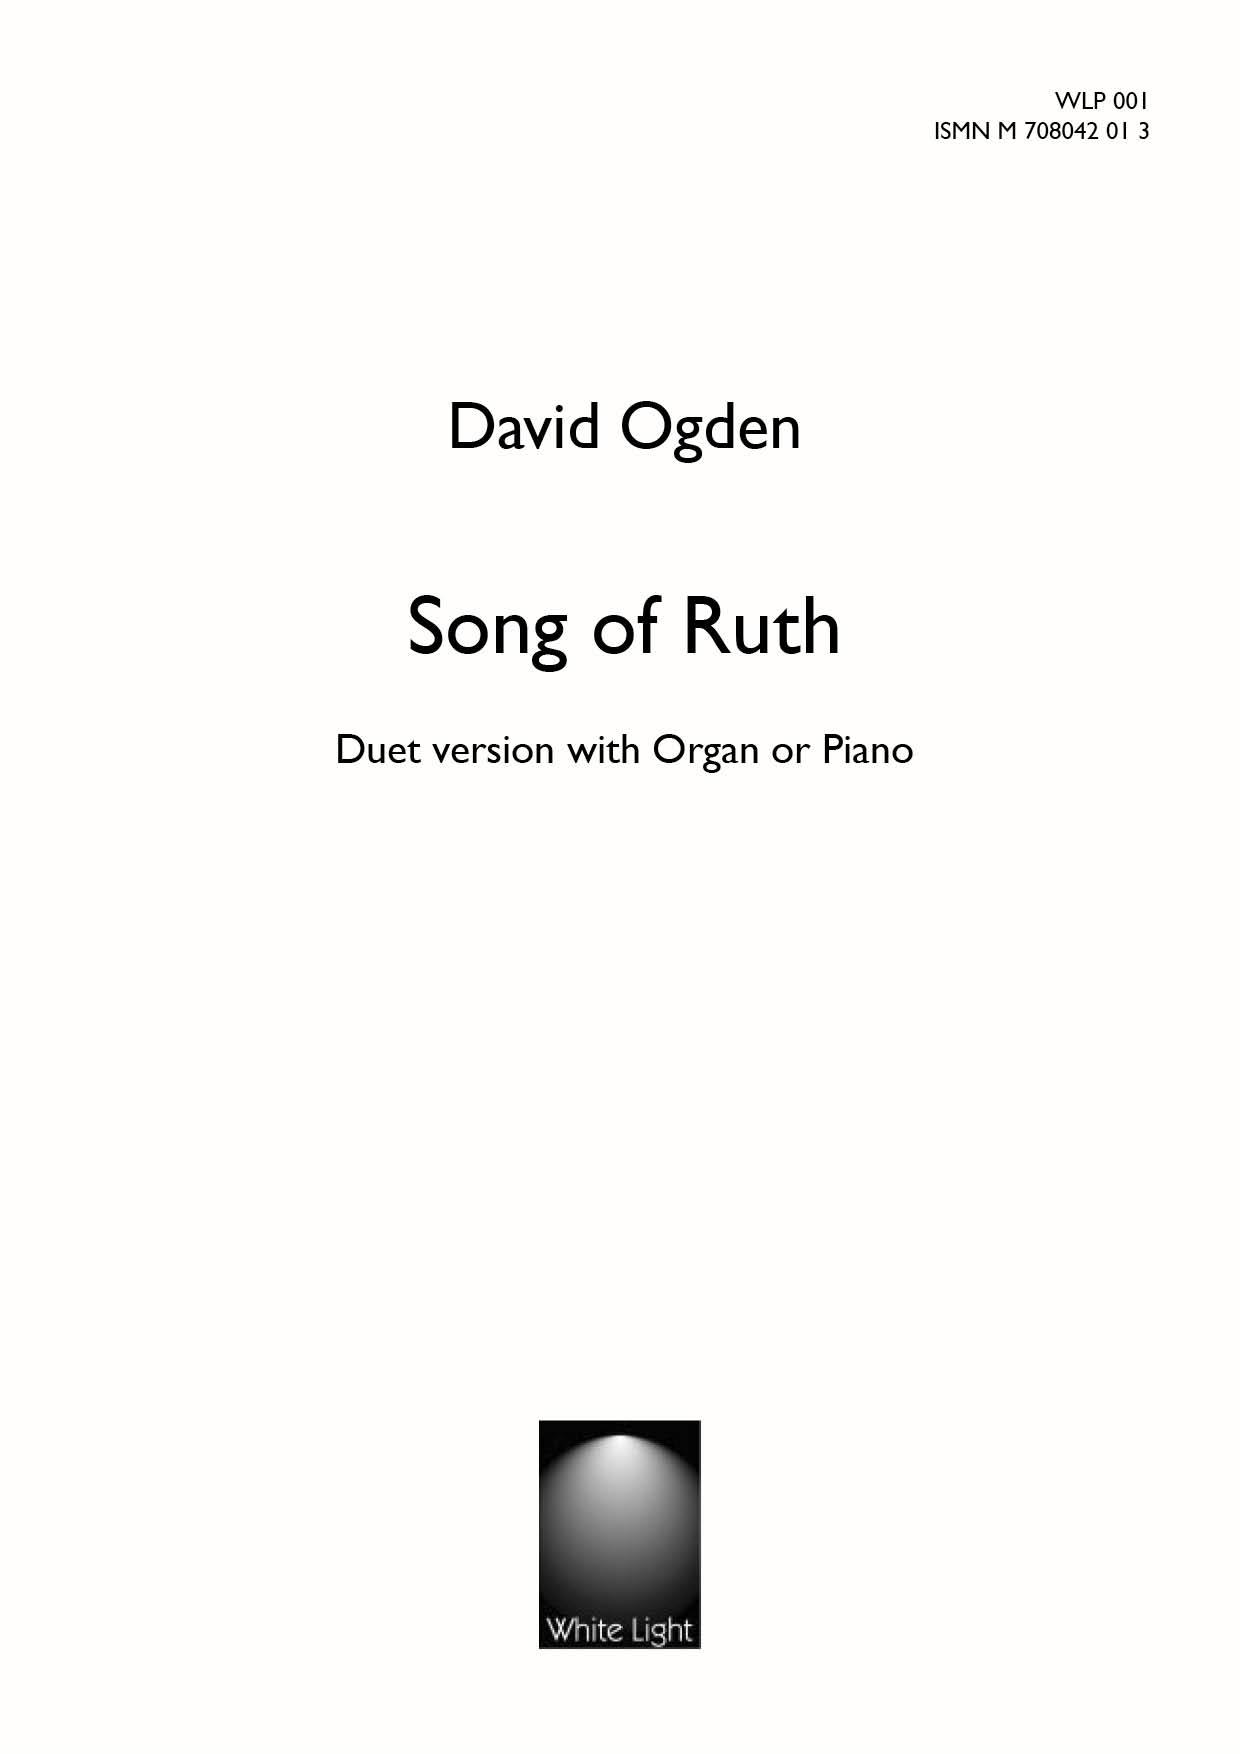 Song of Ruth - duet